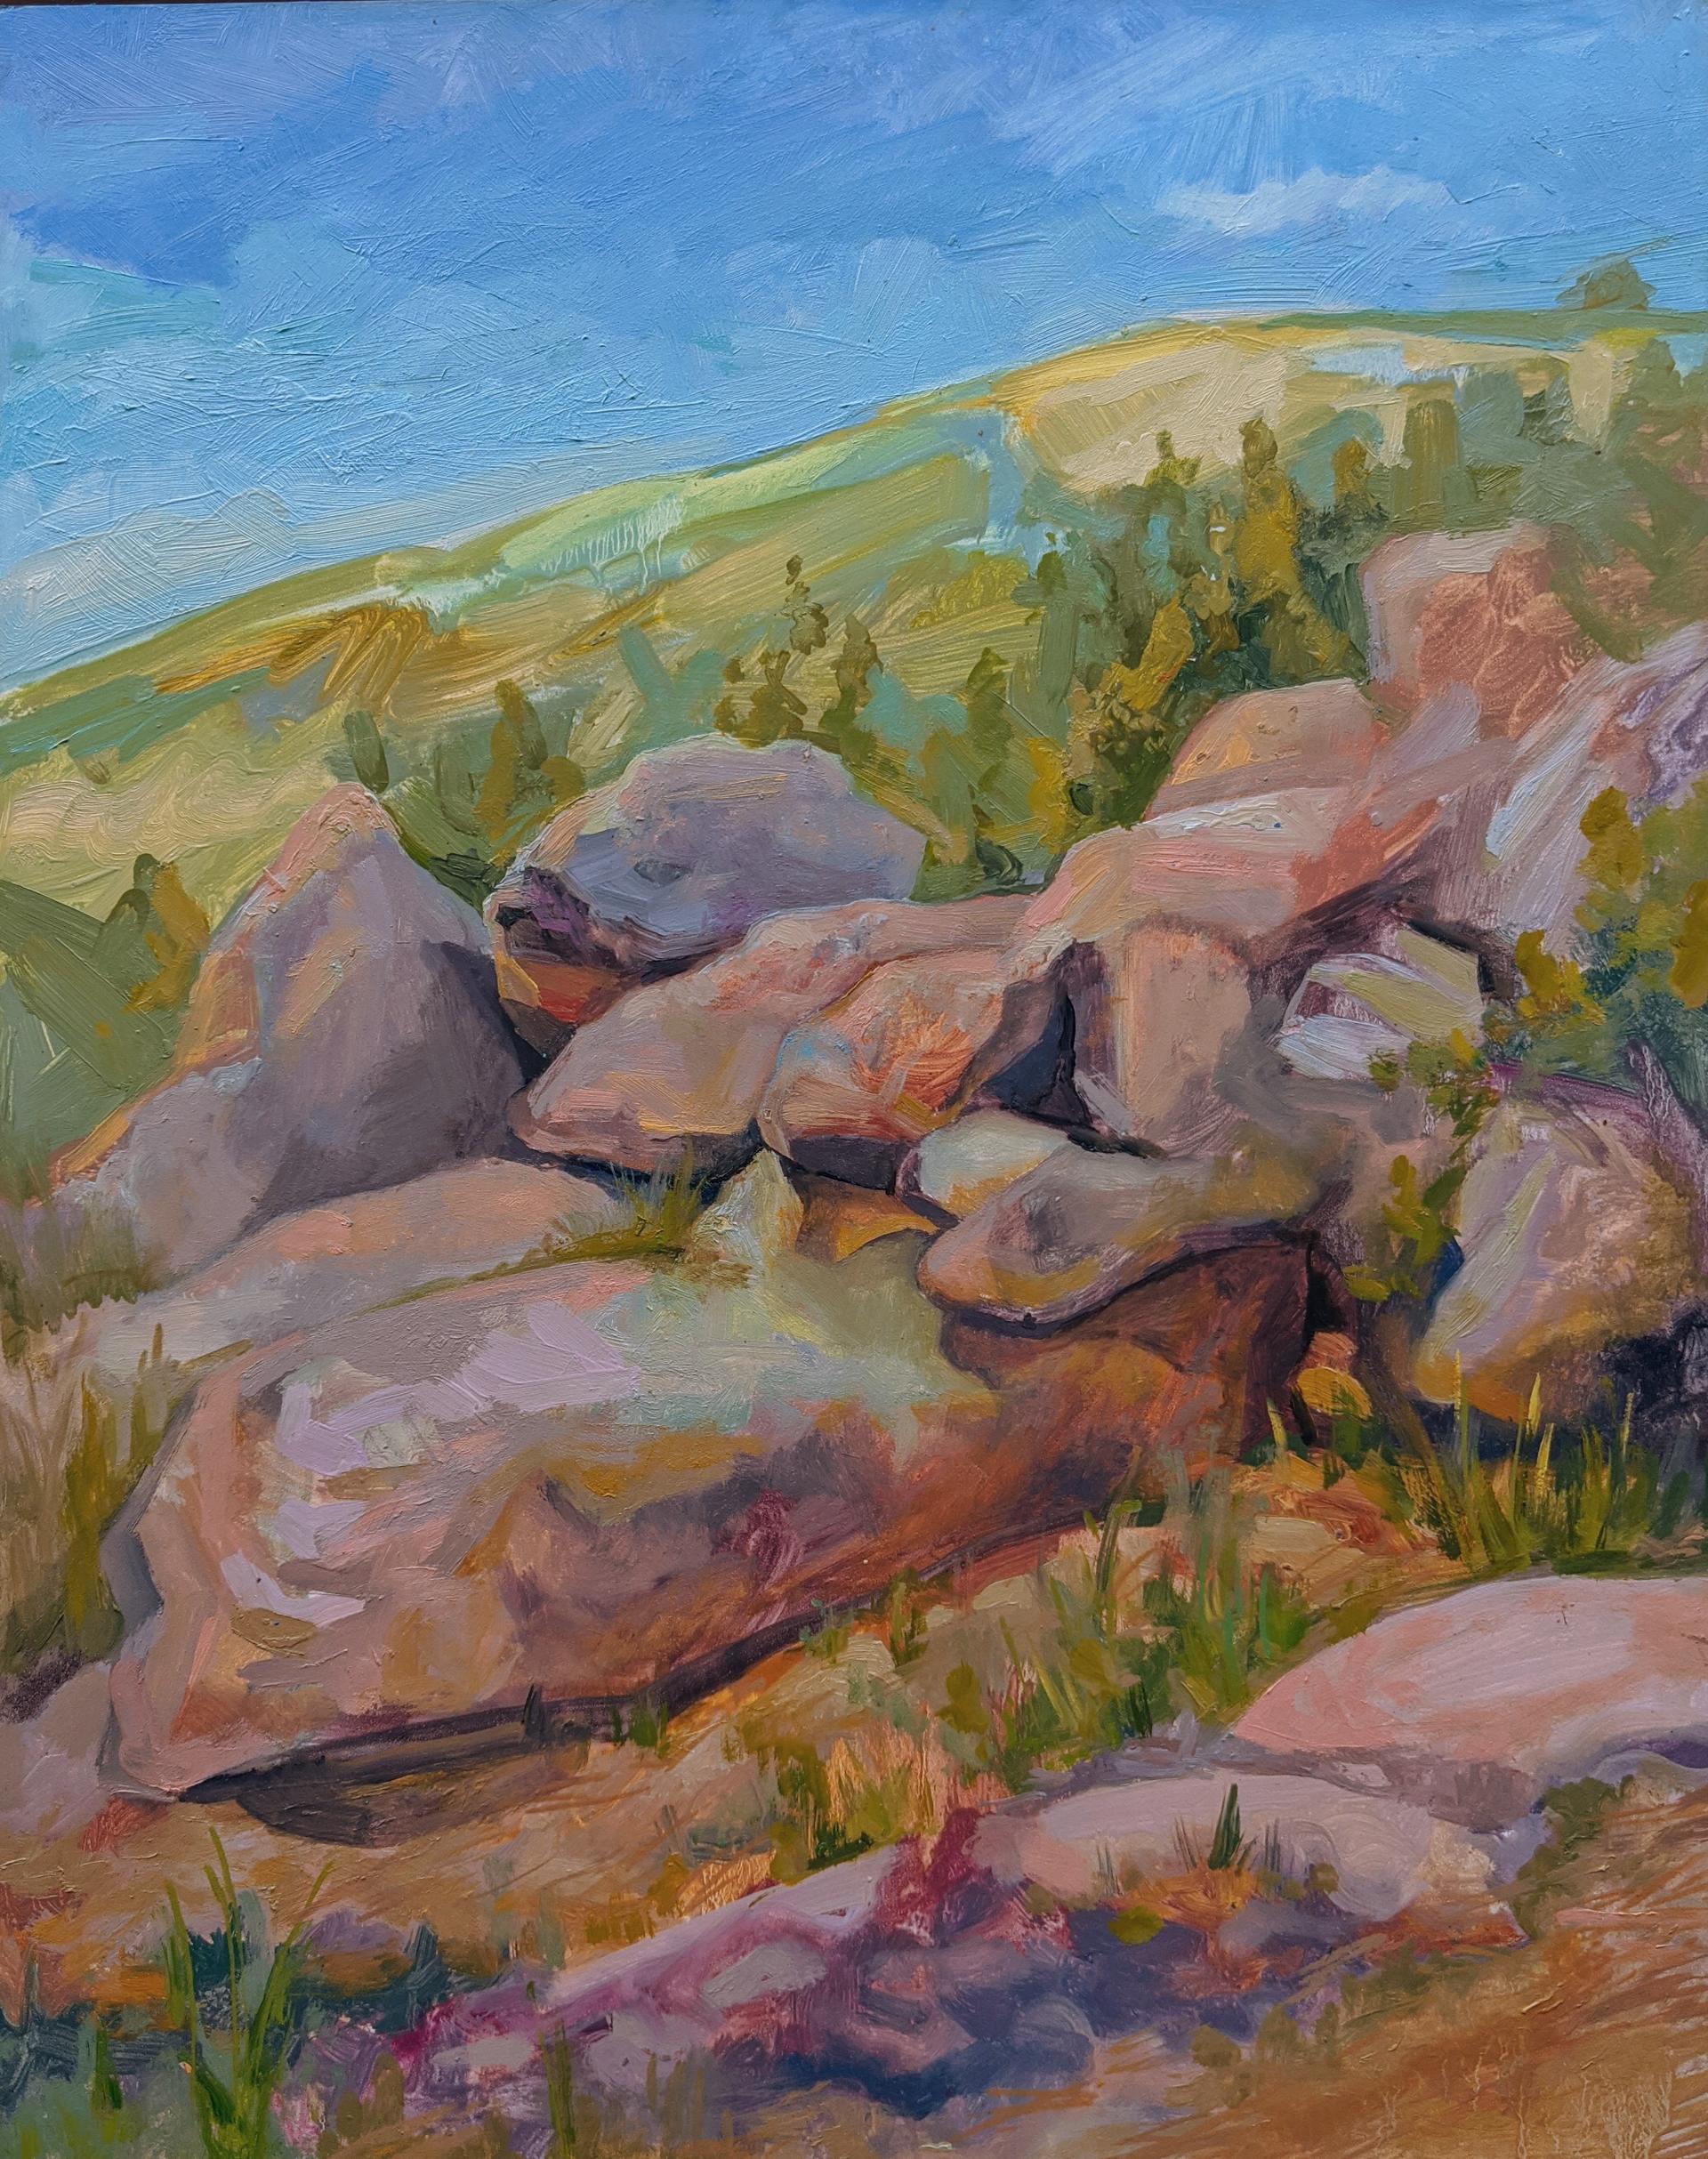 Rocks Tumbling by Charis Carmichael Braun